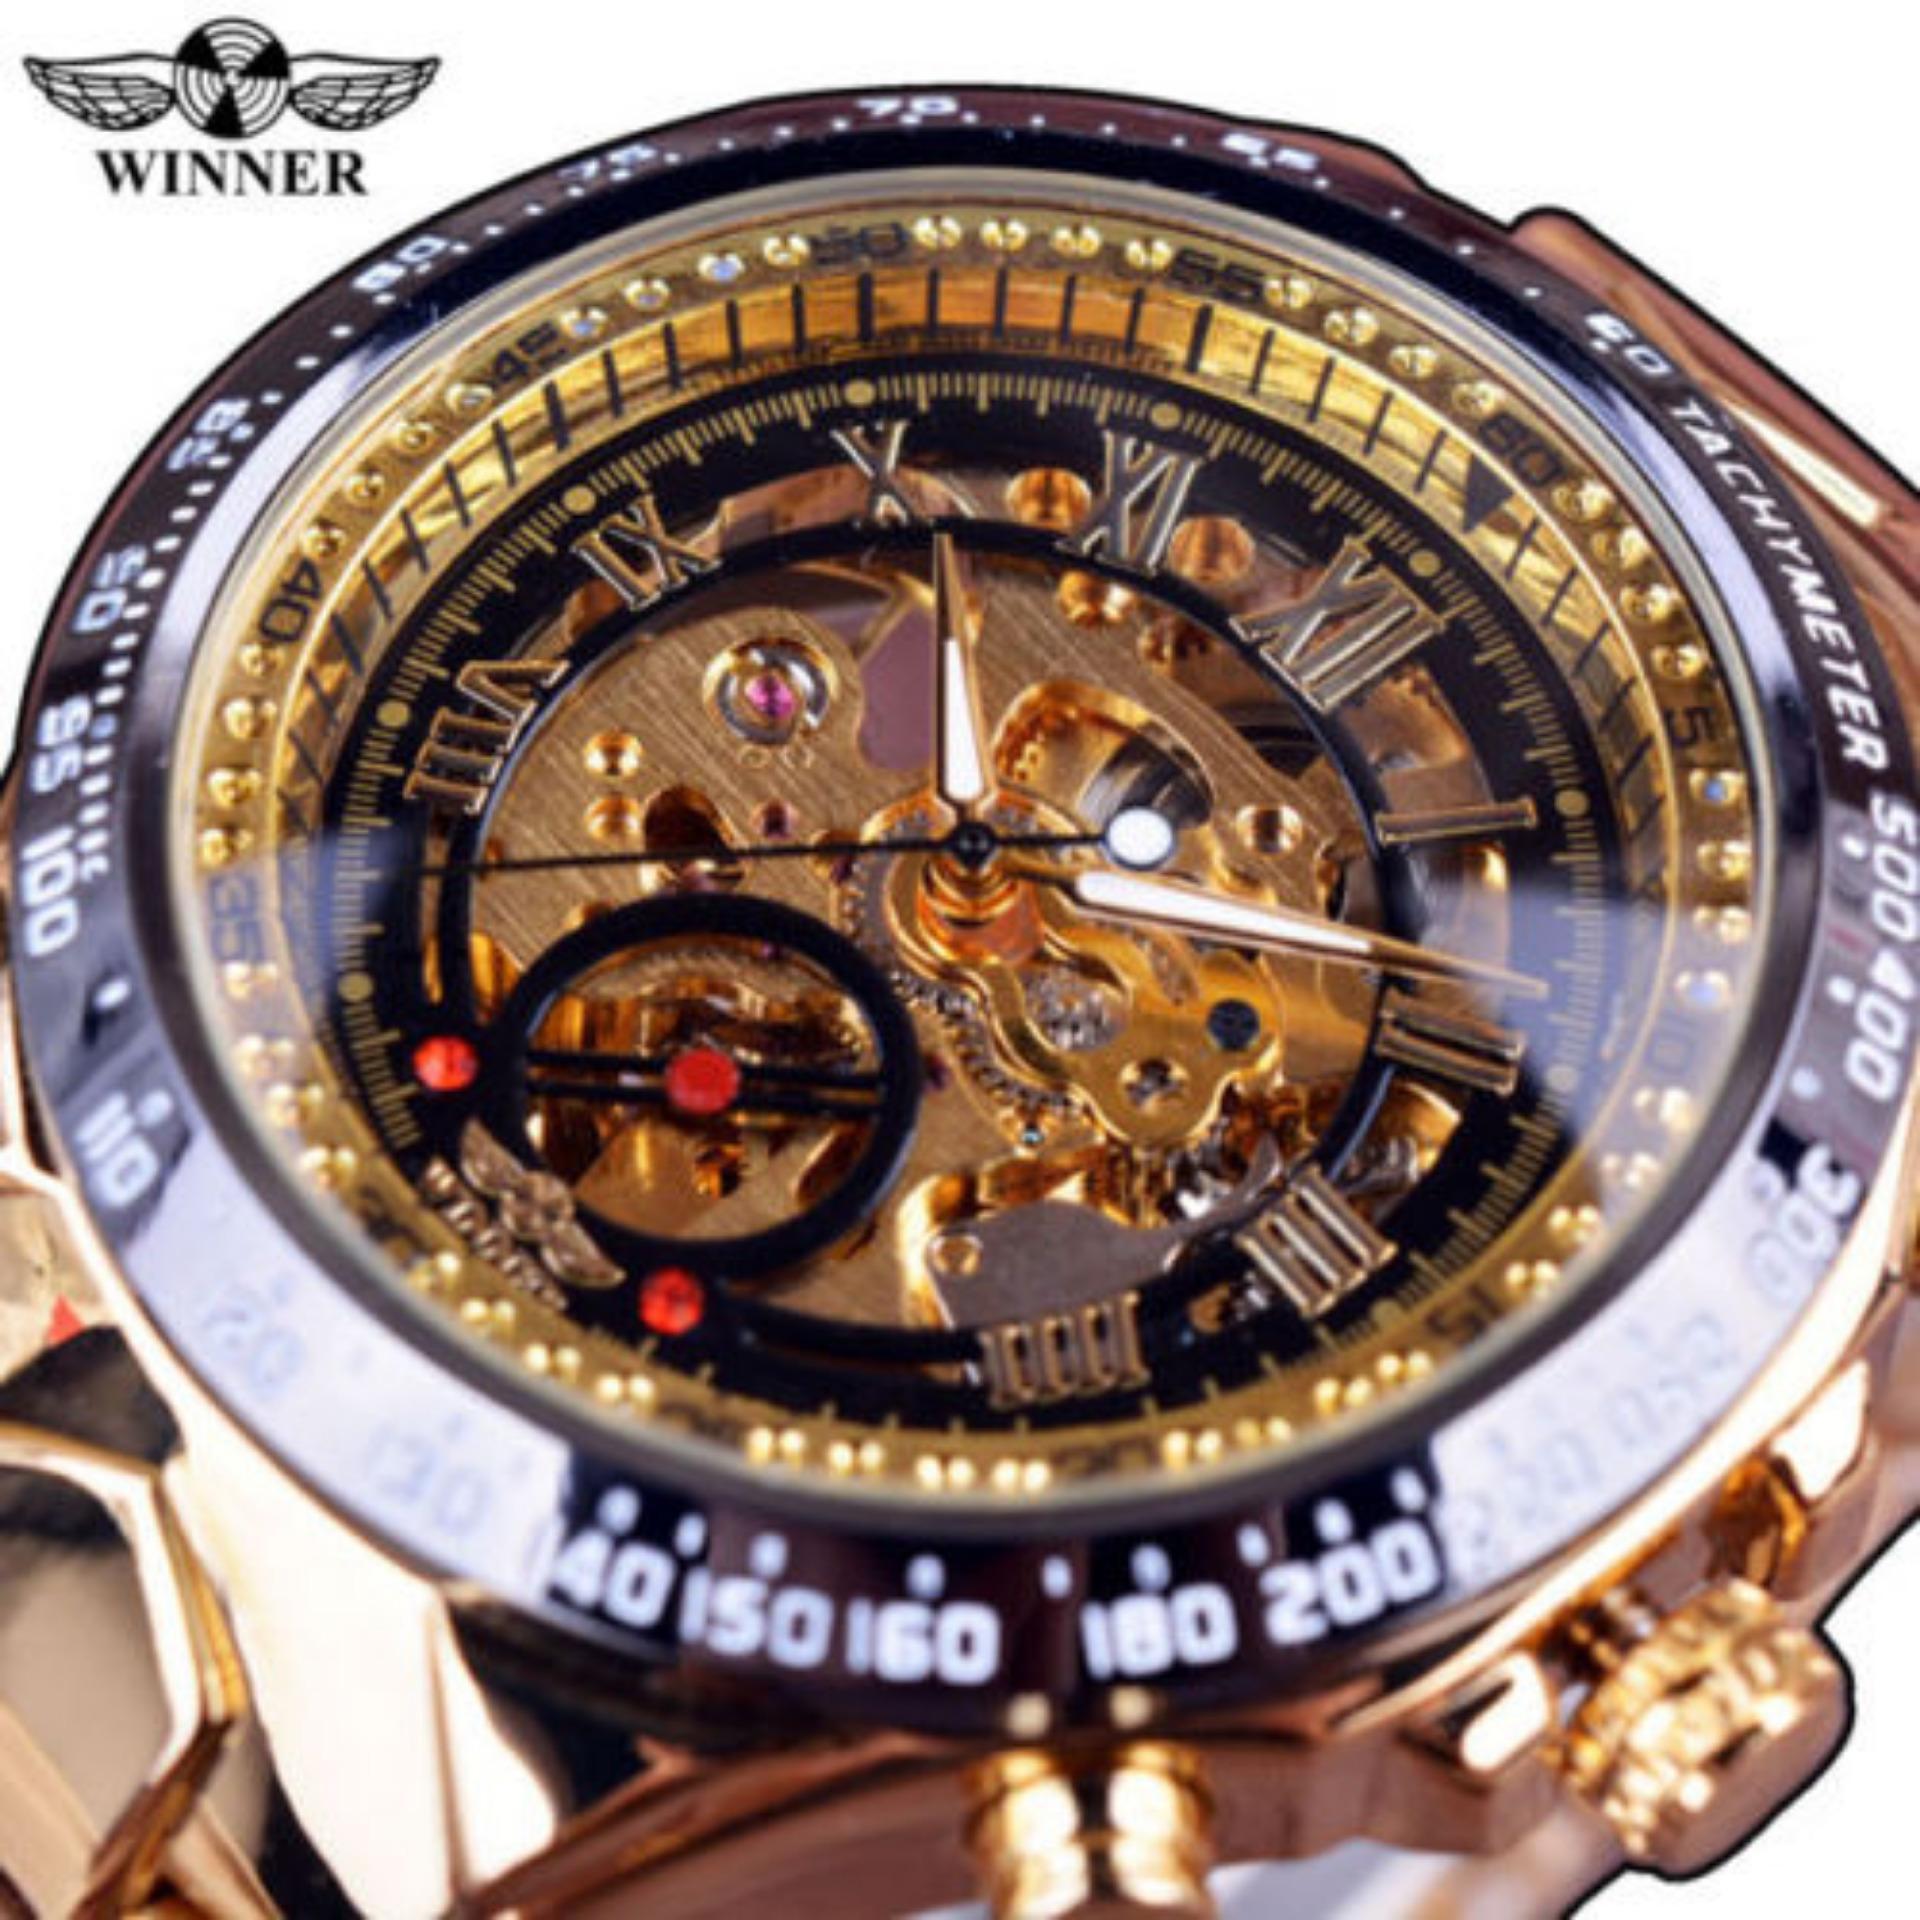 BEST SELLING Noble Sports Men's Automatic Mechanical Watch Metal Skeleton Winner (Black Gold) - intl